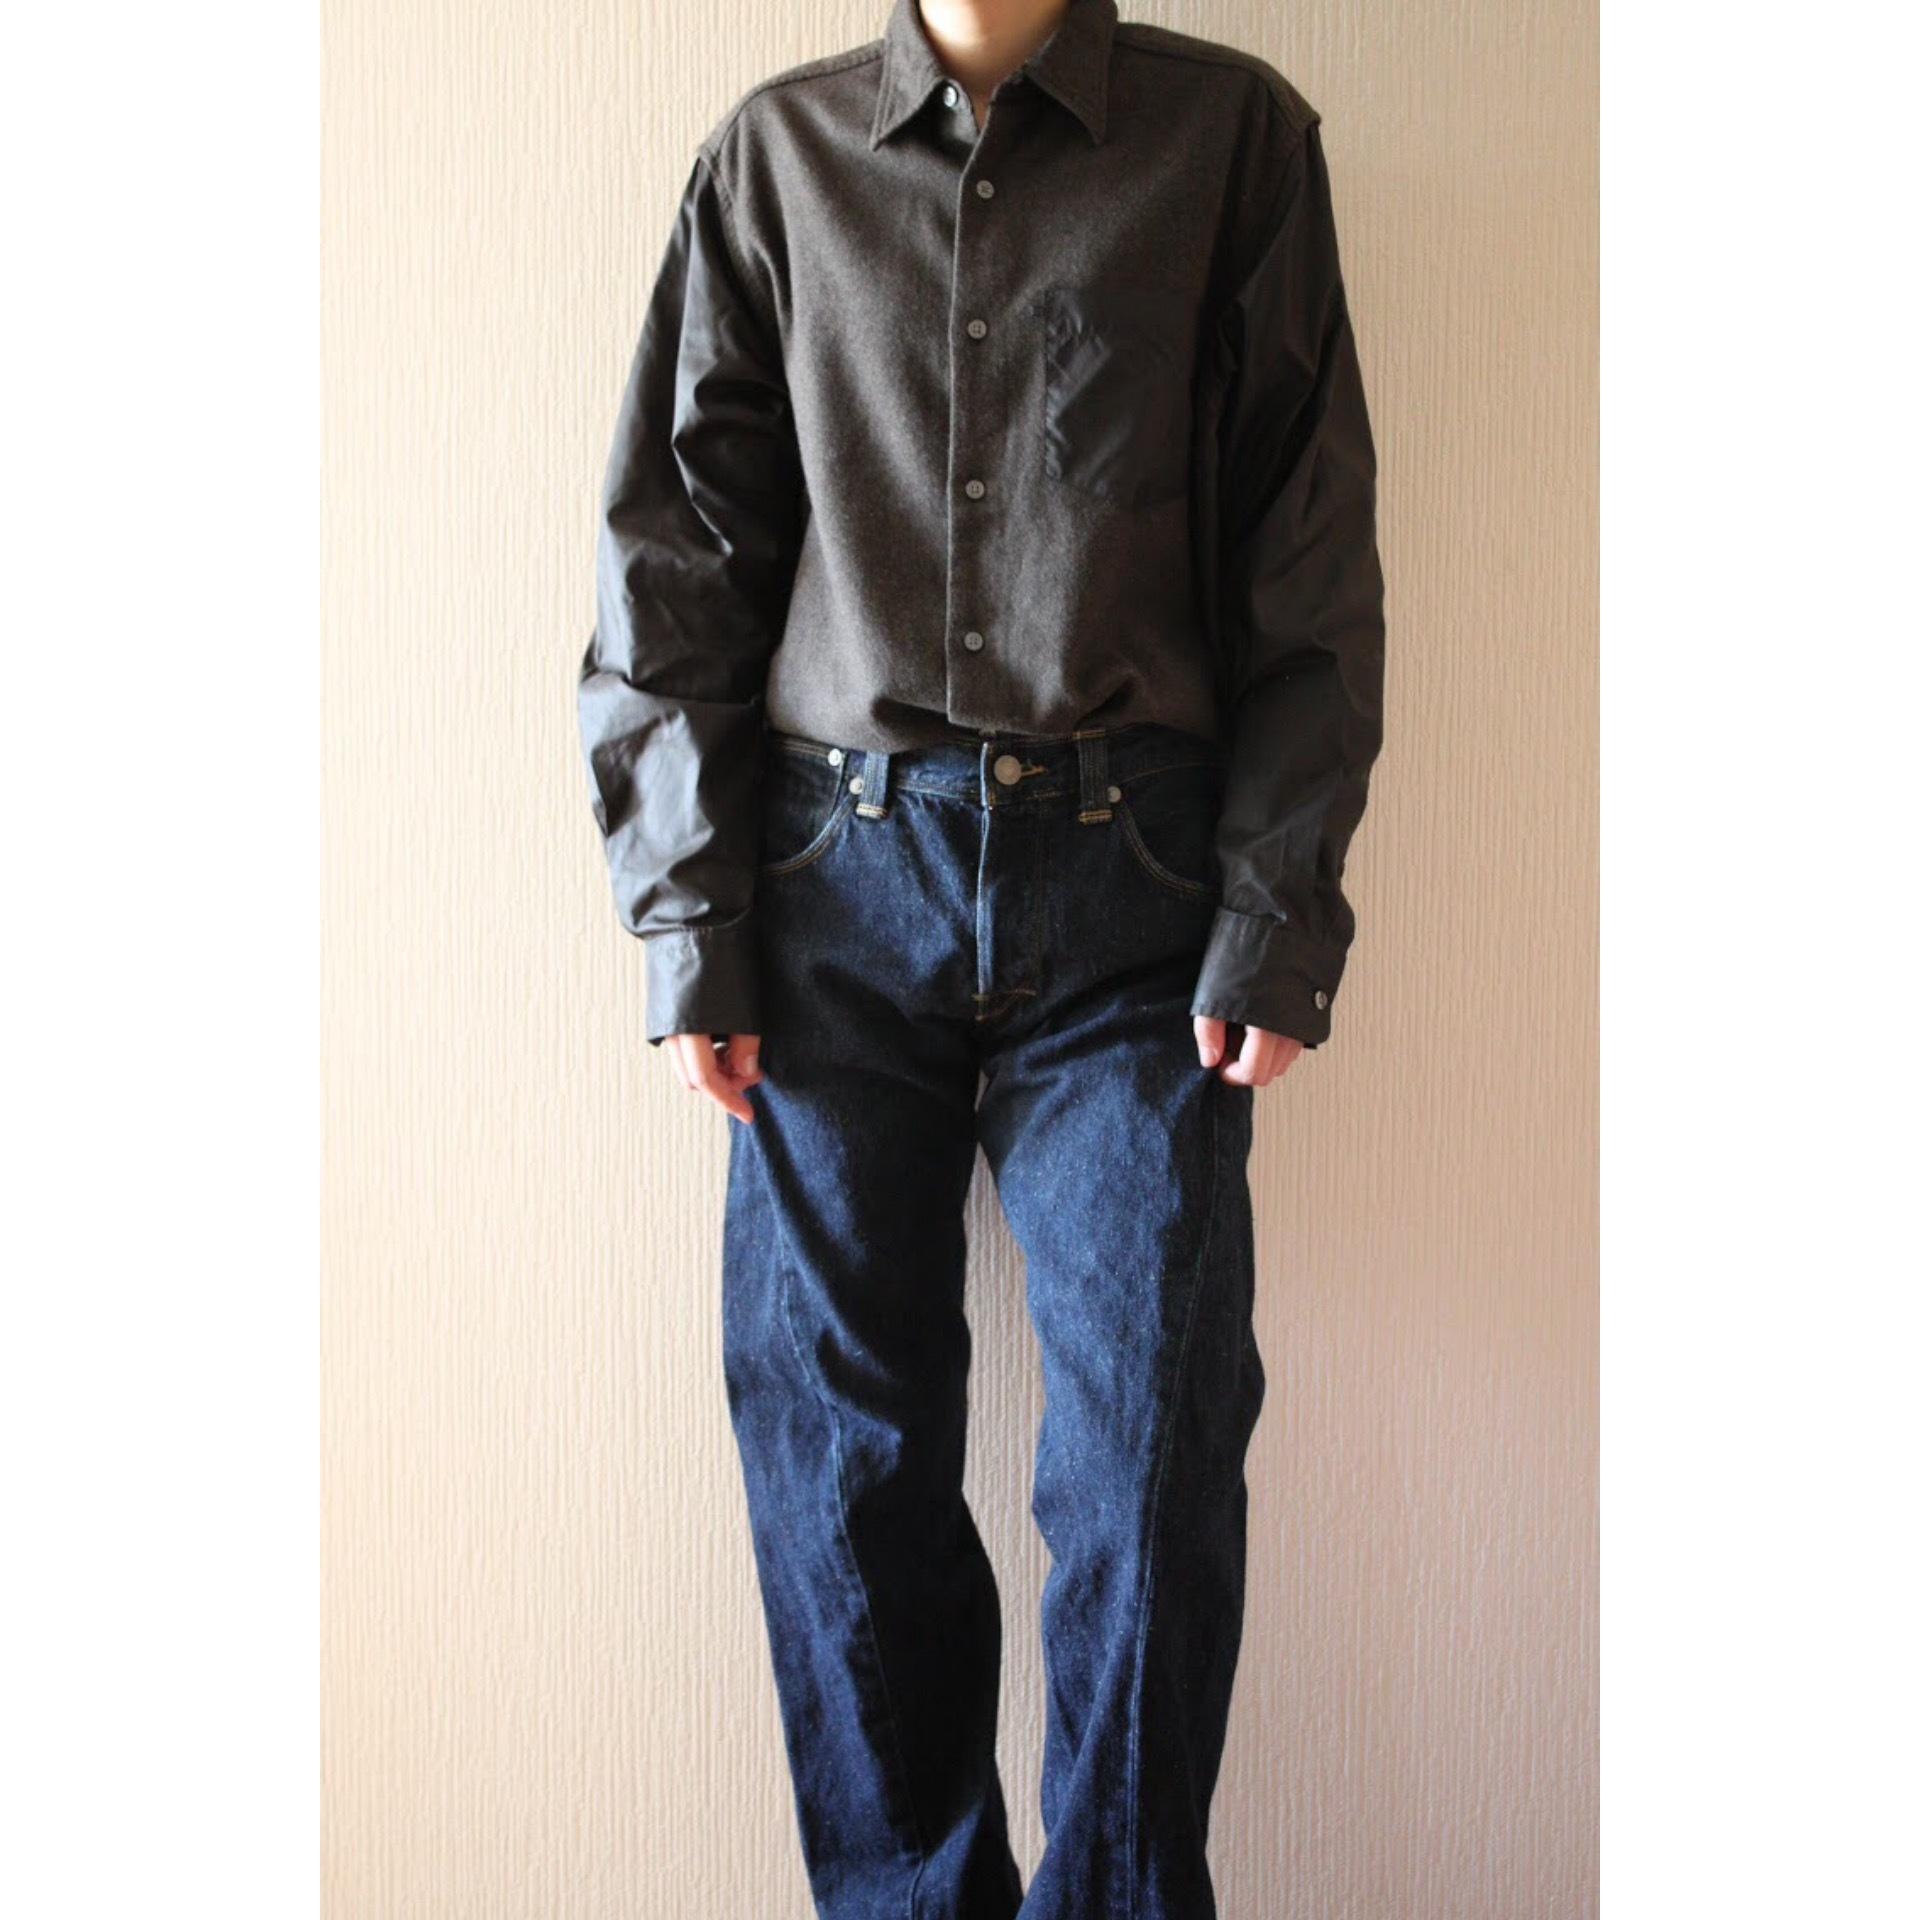 Vintage nylon sleeve shirt by DKNY